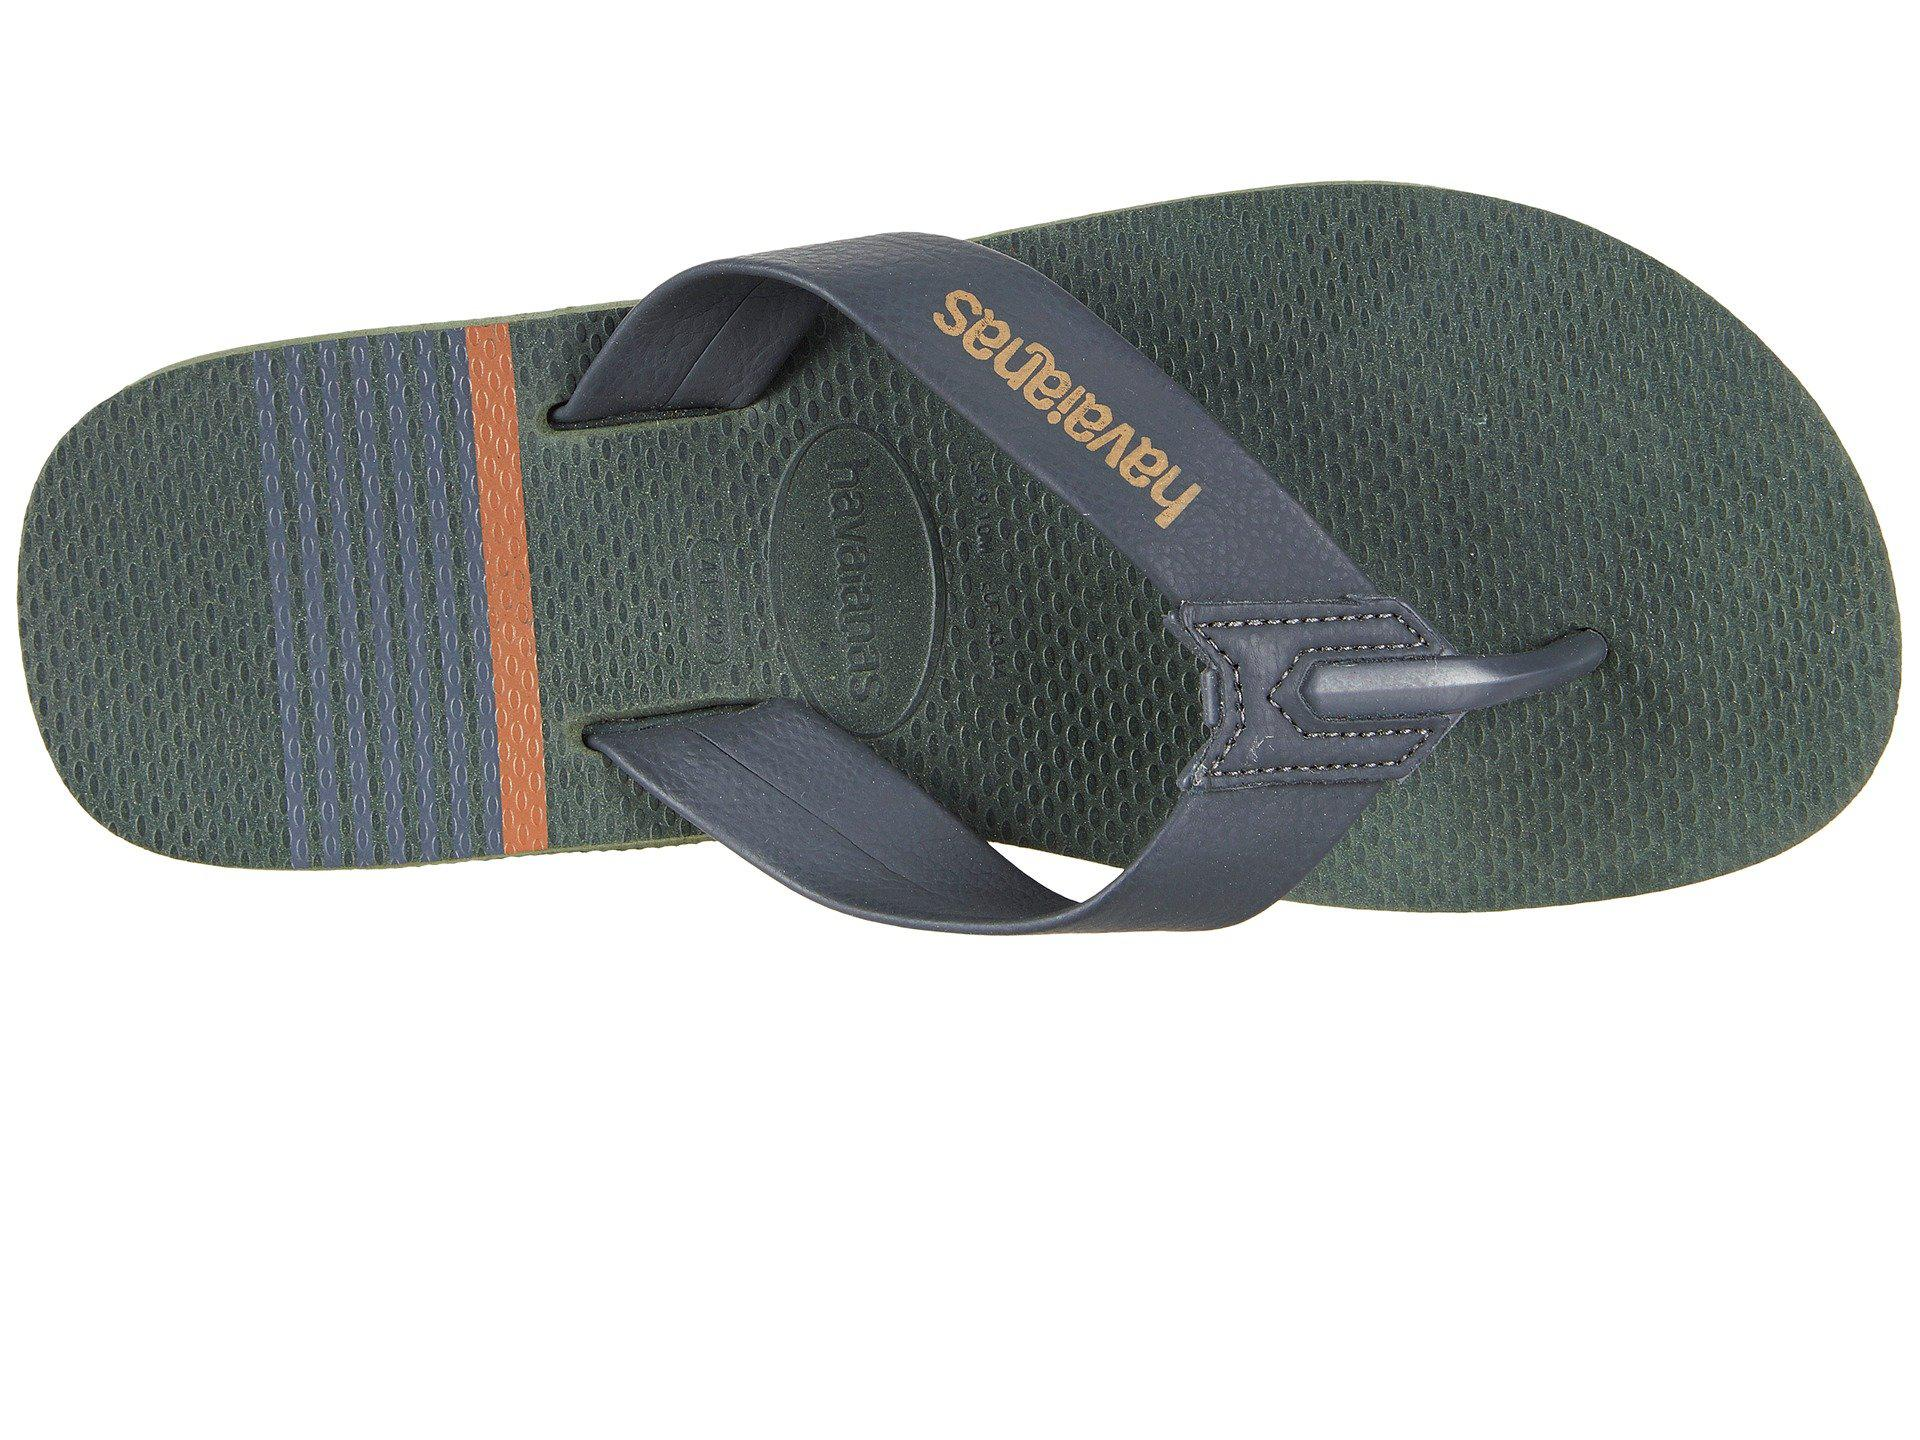 0493f2ac5 Havaianas - Green Urban Craft Flip Flops for Men - Lyst. View fullscreen